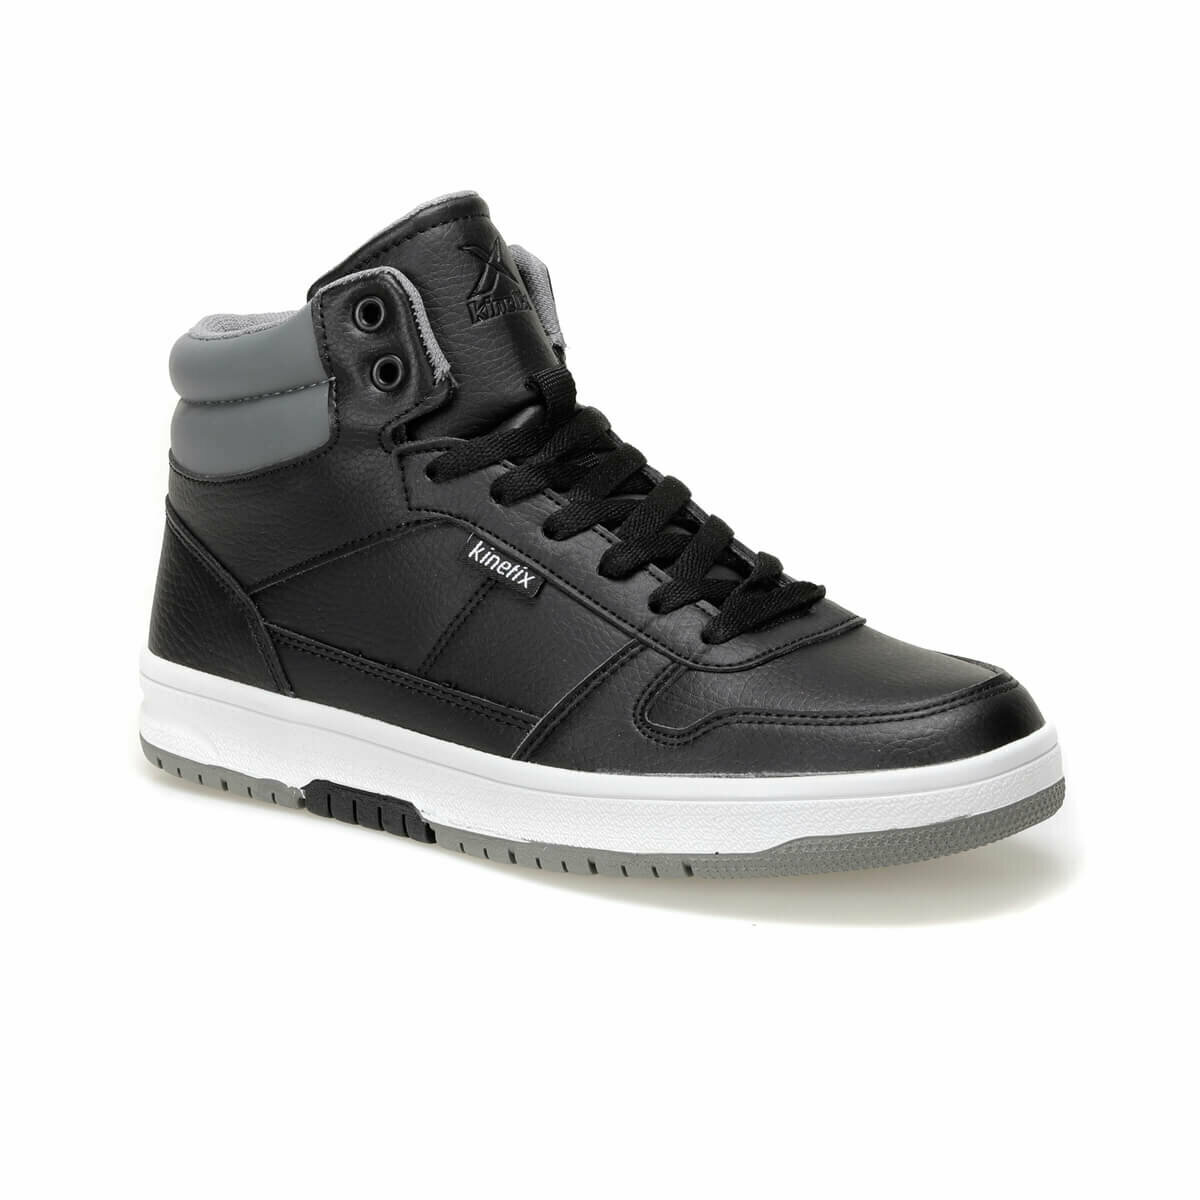 FLO BERGER HI M Black Men 'S Sneaker Shoes KINETIX